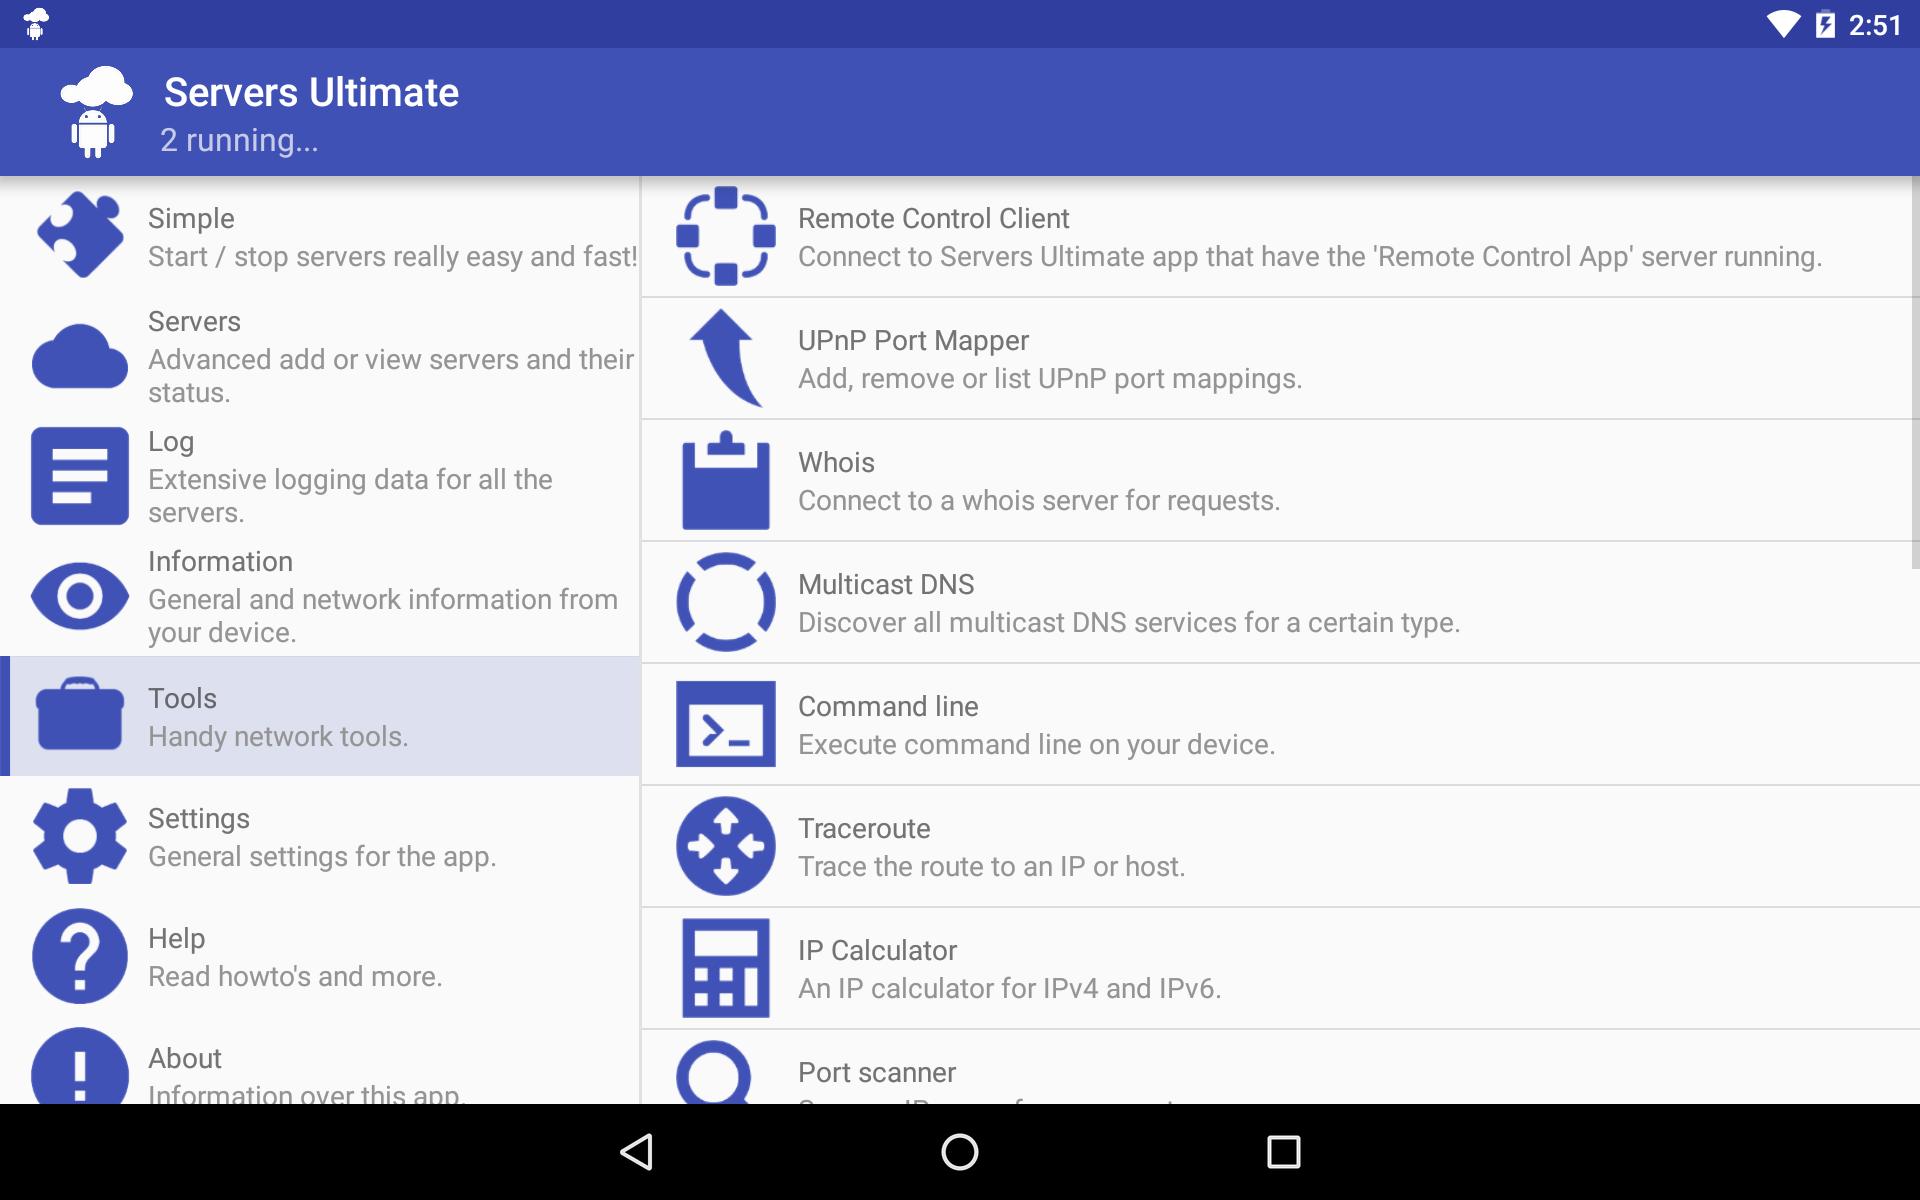 Servers Ultimate Pro Screenshot